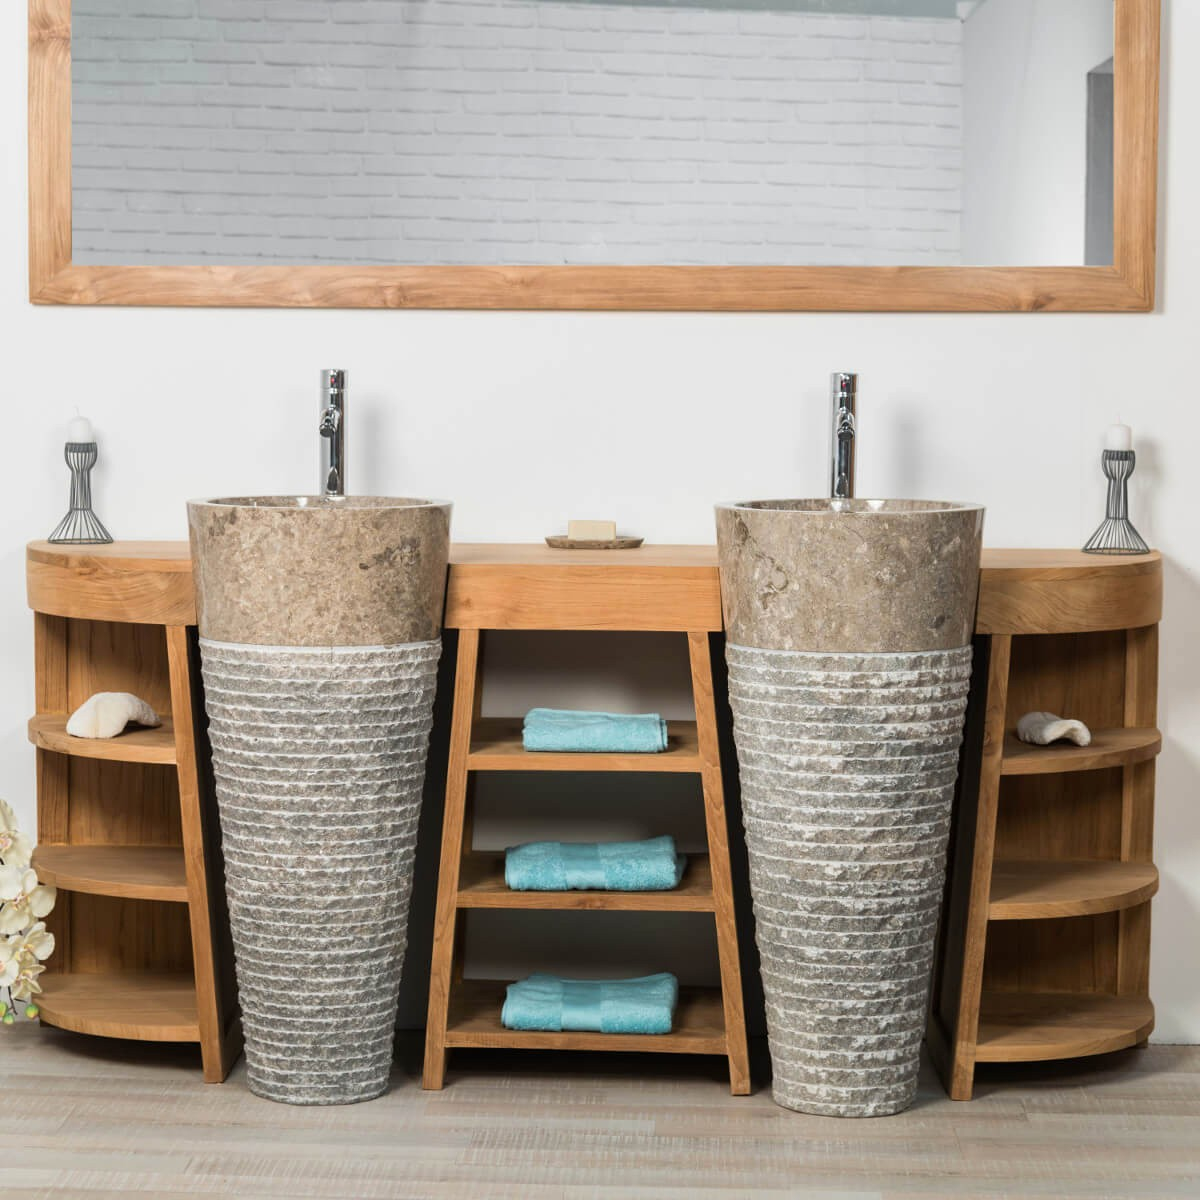 Double Vasque Ikea Impressionnant Photos Meuble Double Vasque Ancien Meuble Lavabo Luxe Meuble Haut De Salle